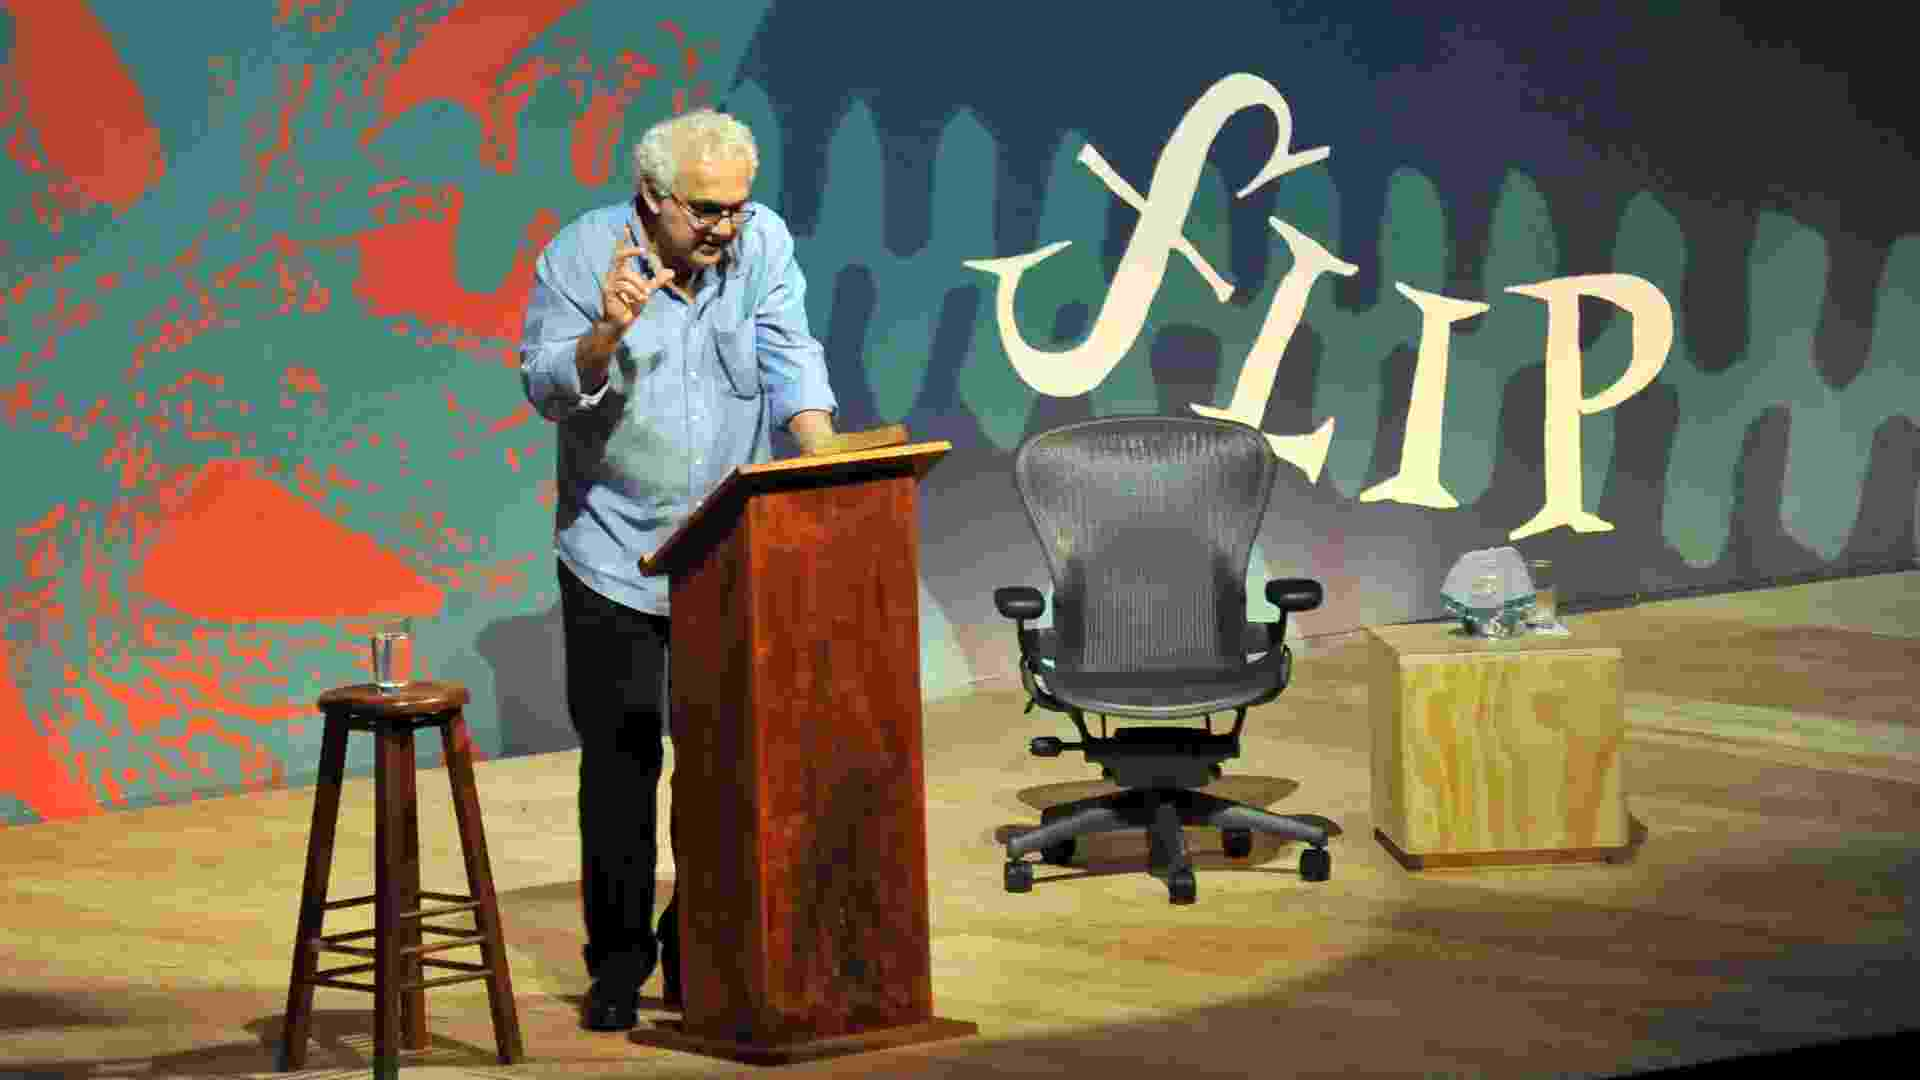 3.jul.2013 - O escritor Milton Hatoum fala sobre Graciliano Ramos durante evento de abertura da Flip 2013 - Luiz Roberto Lima / Estadão Conteúdo